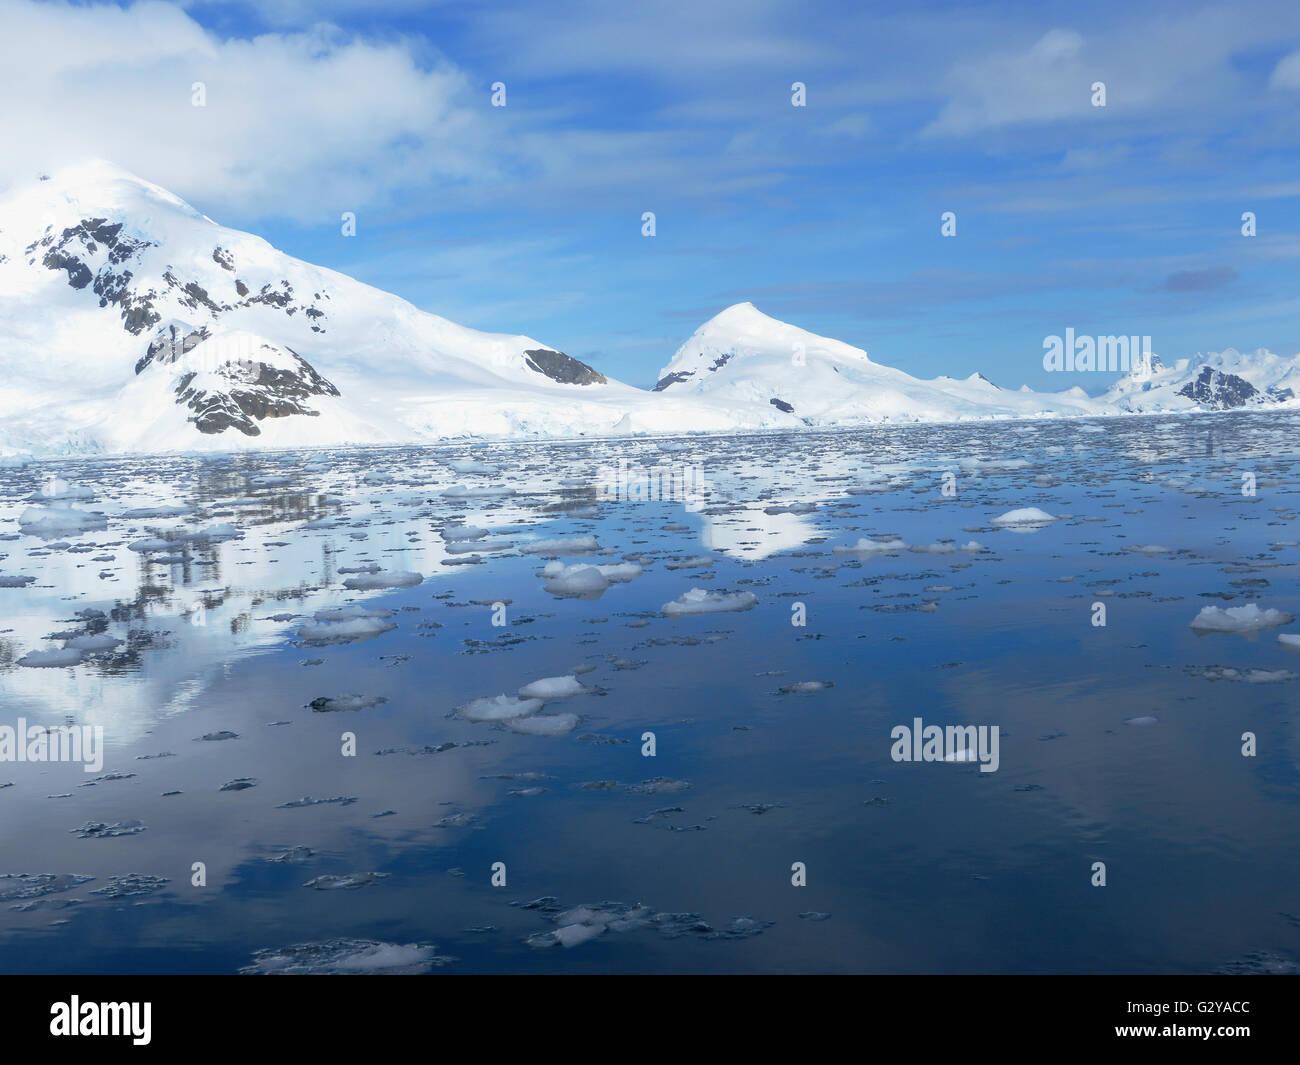 Antarctic mountains and melting sea ice at Port Lockroy region of the Antarctic Peninsula - Stock Image